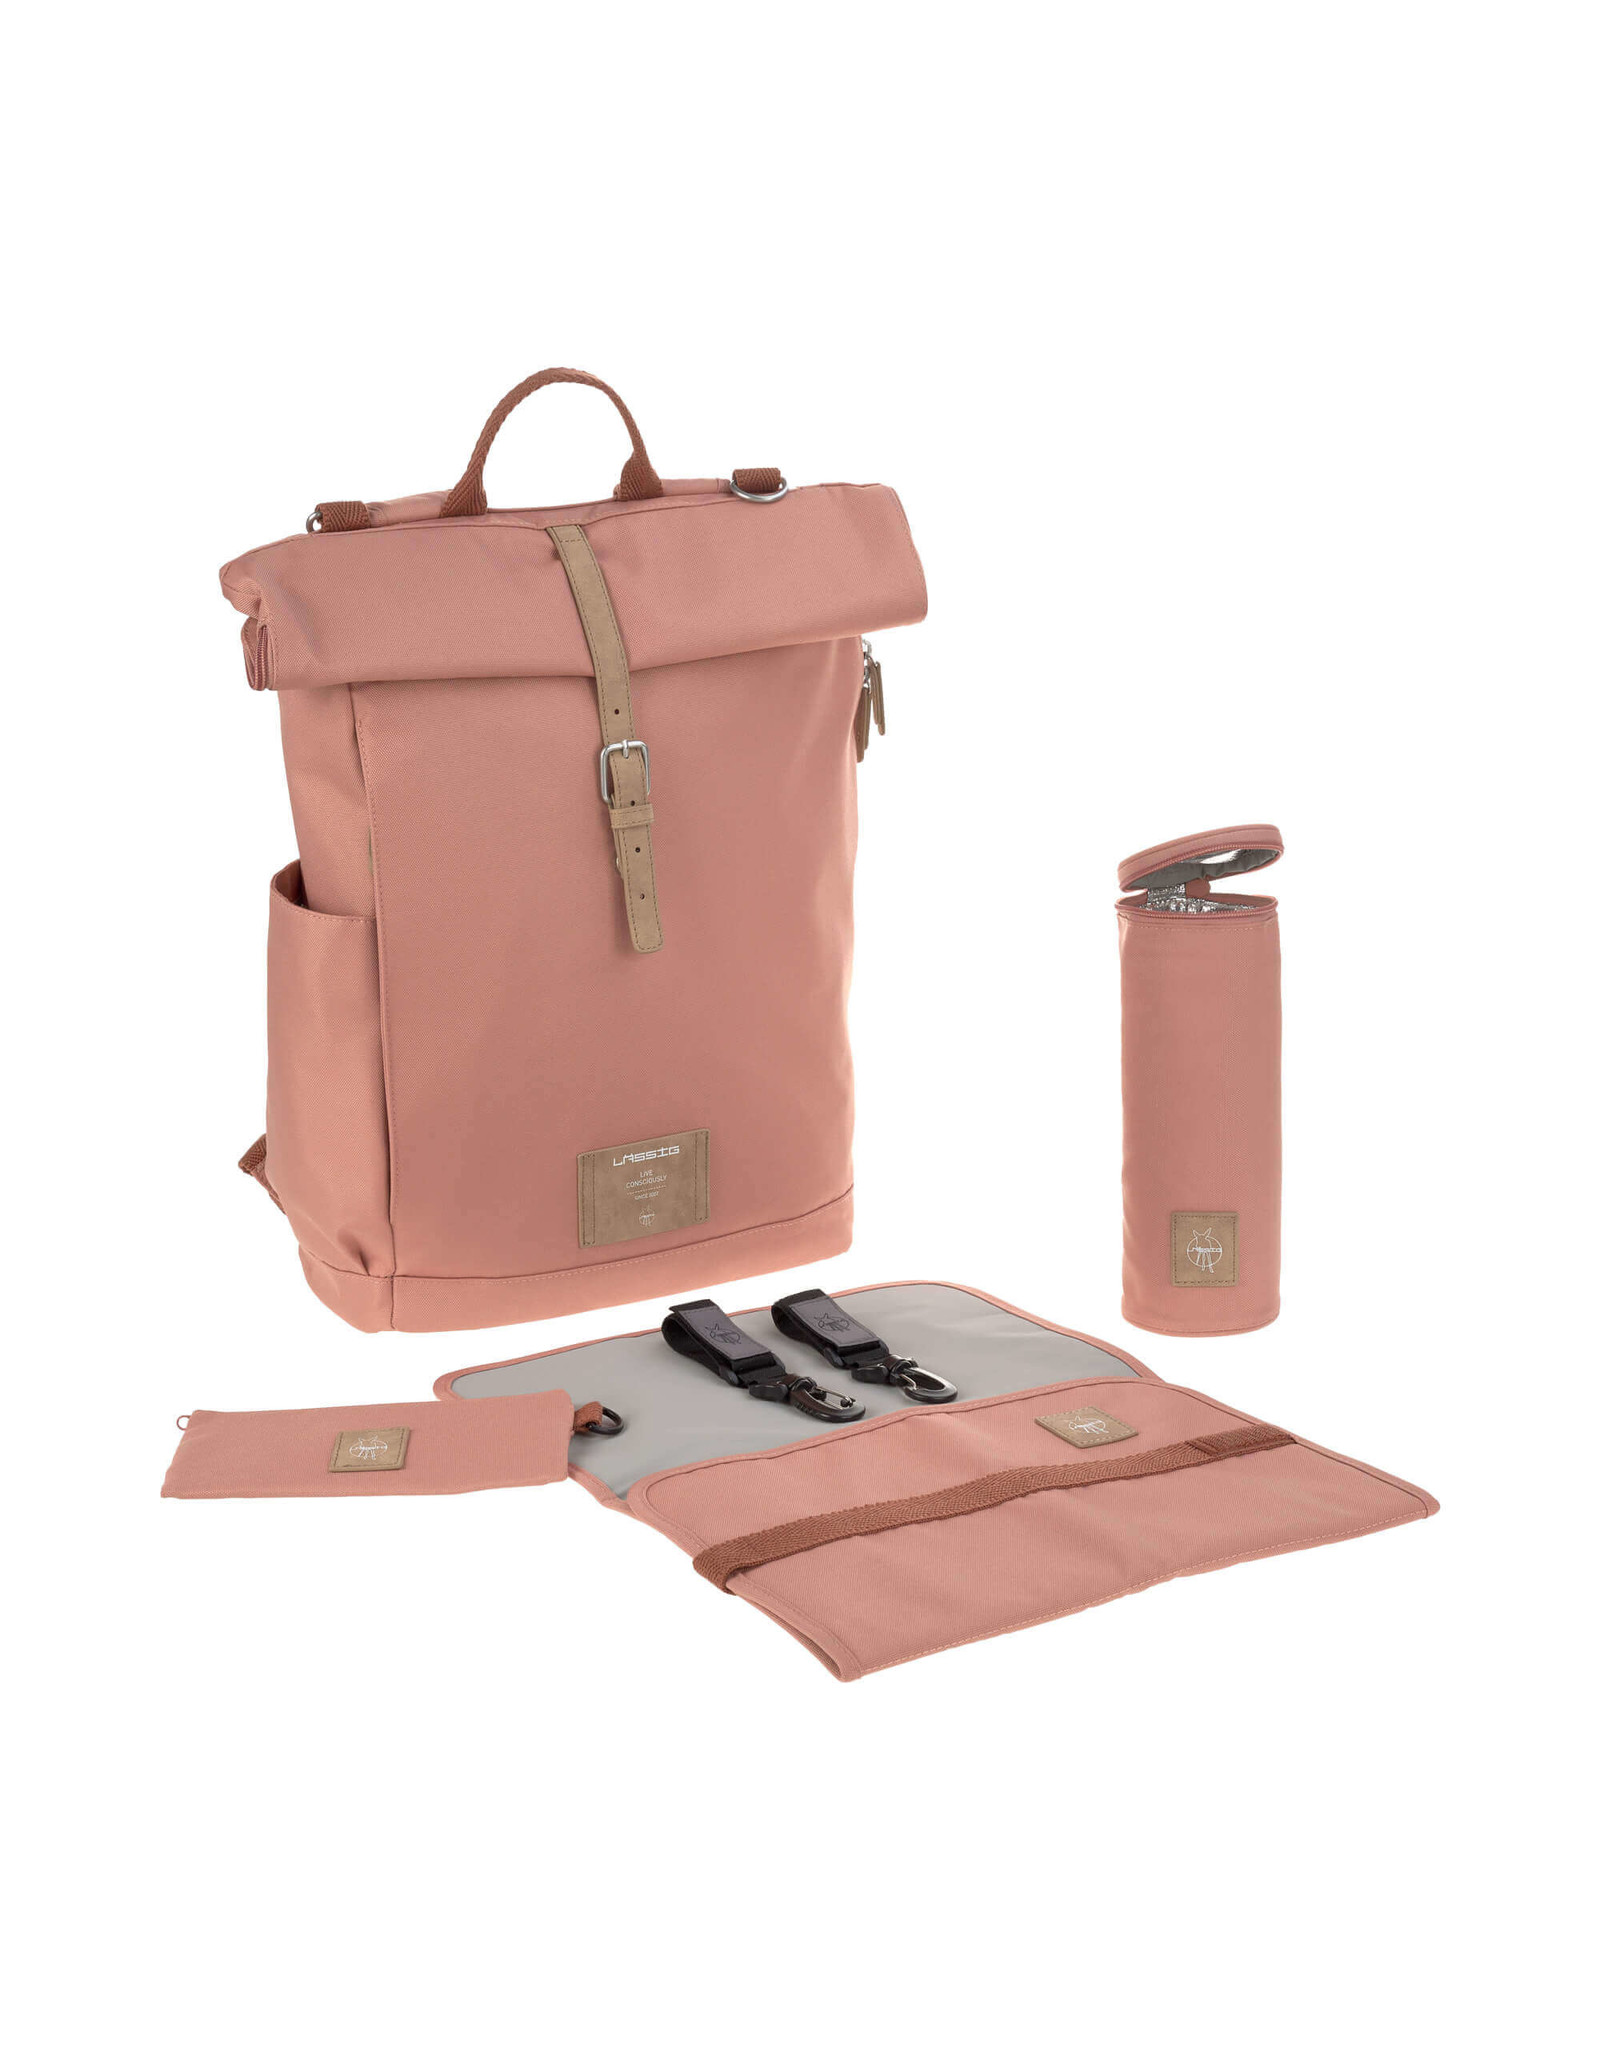 Lassig Lassig Greenlabel Rolltop Backpack Cinnamon